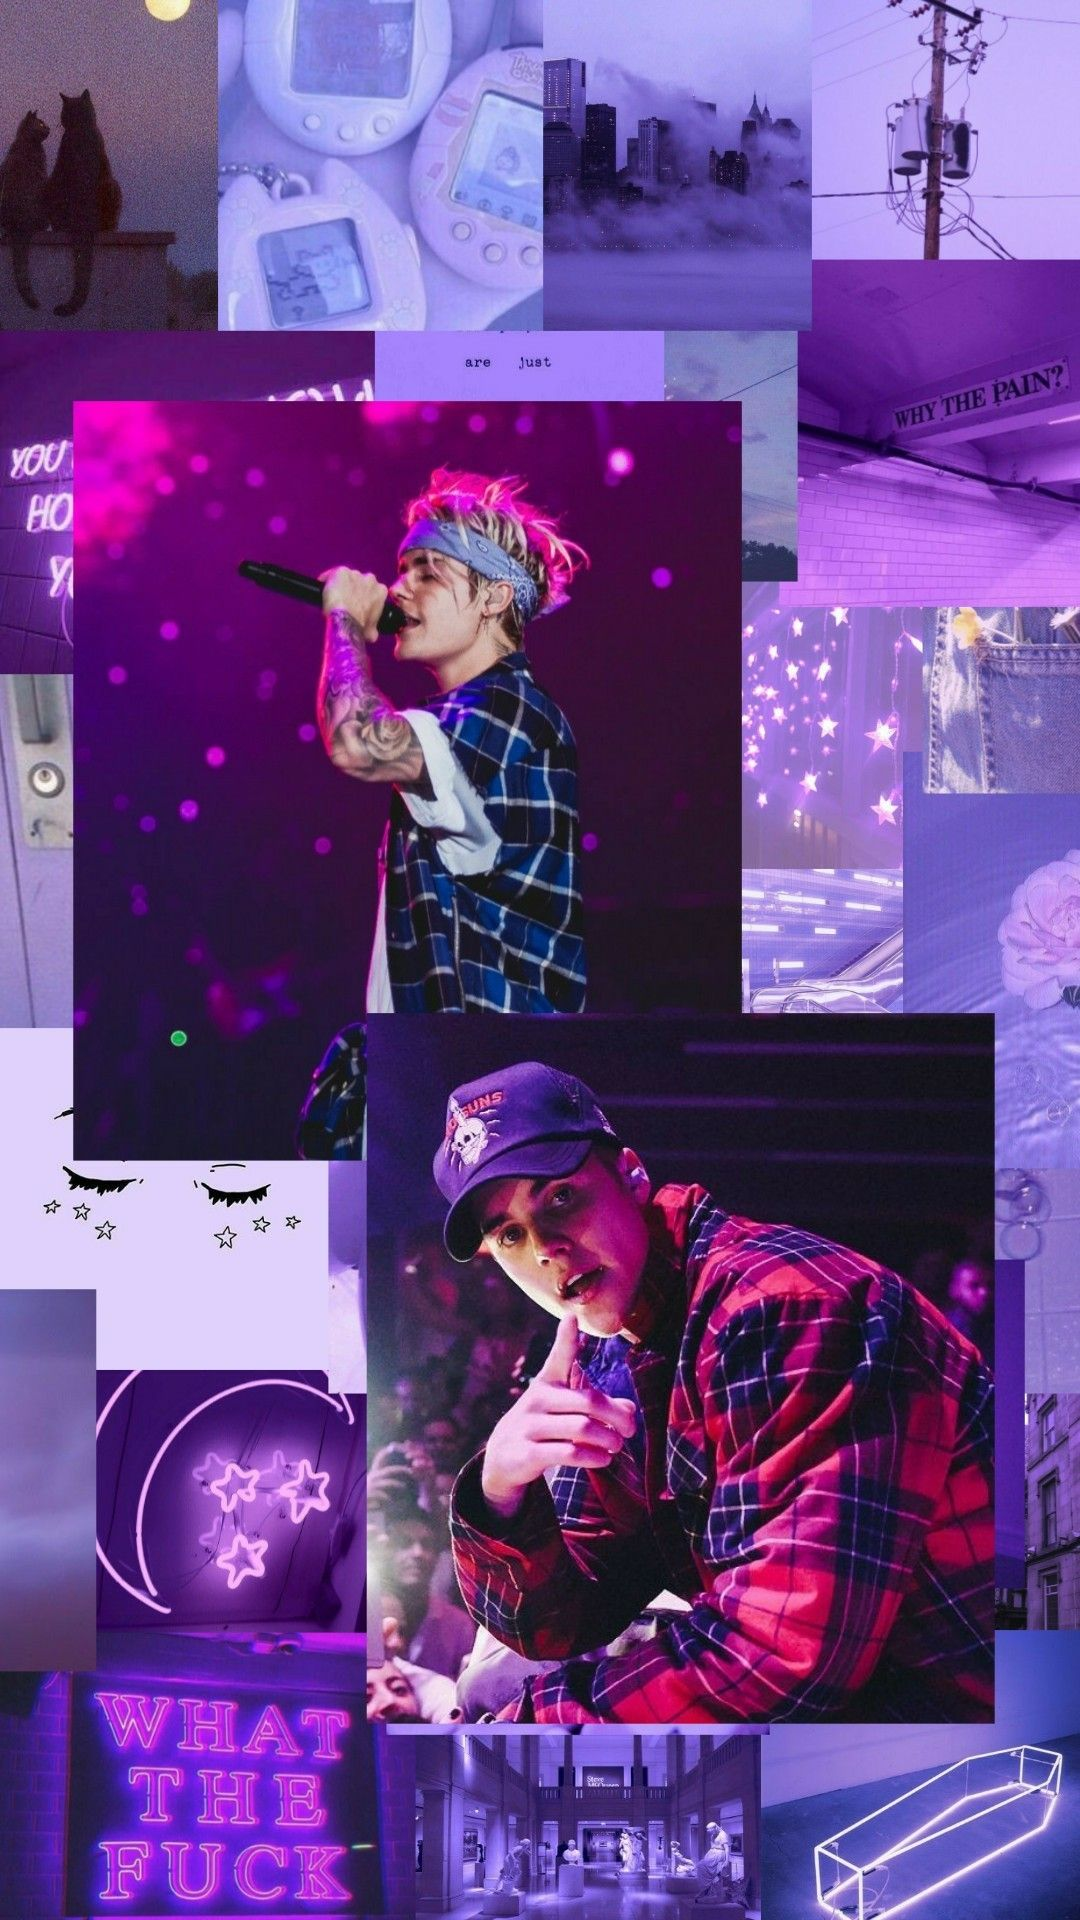 Justin Bieber Wallpaper Purple Justin Bieber Wallpaper Justin Bieber Lockscreen Justin Bieber Posters